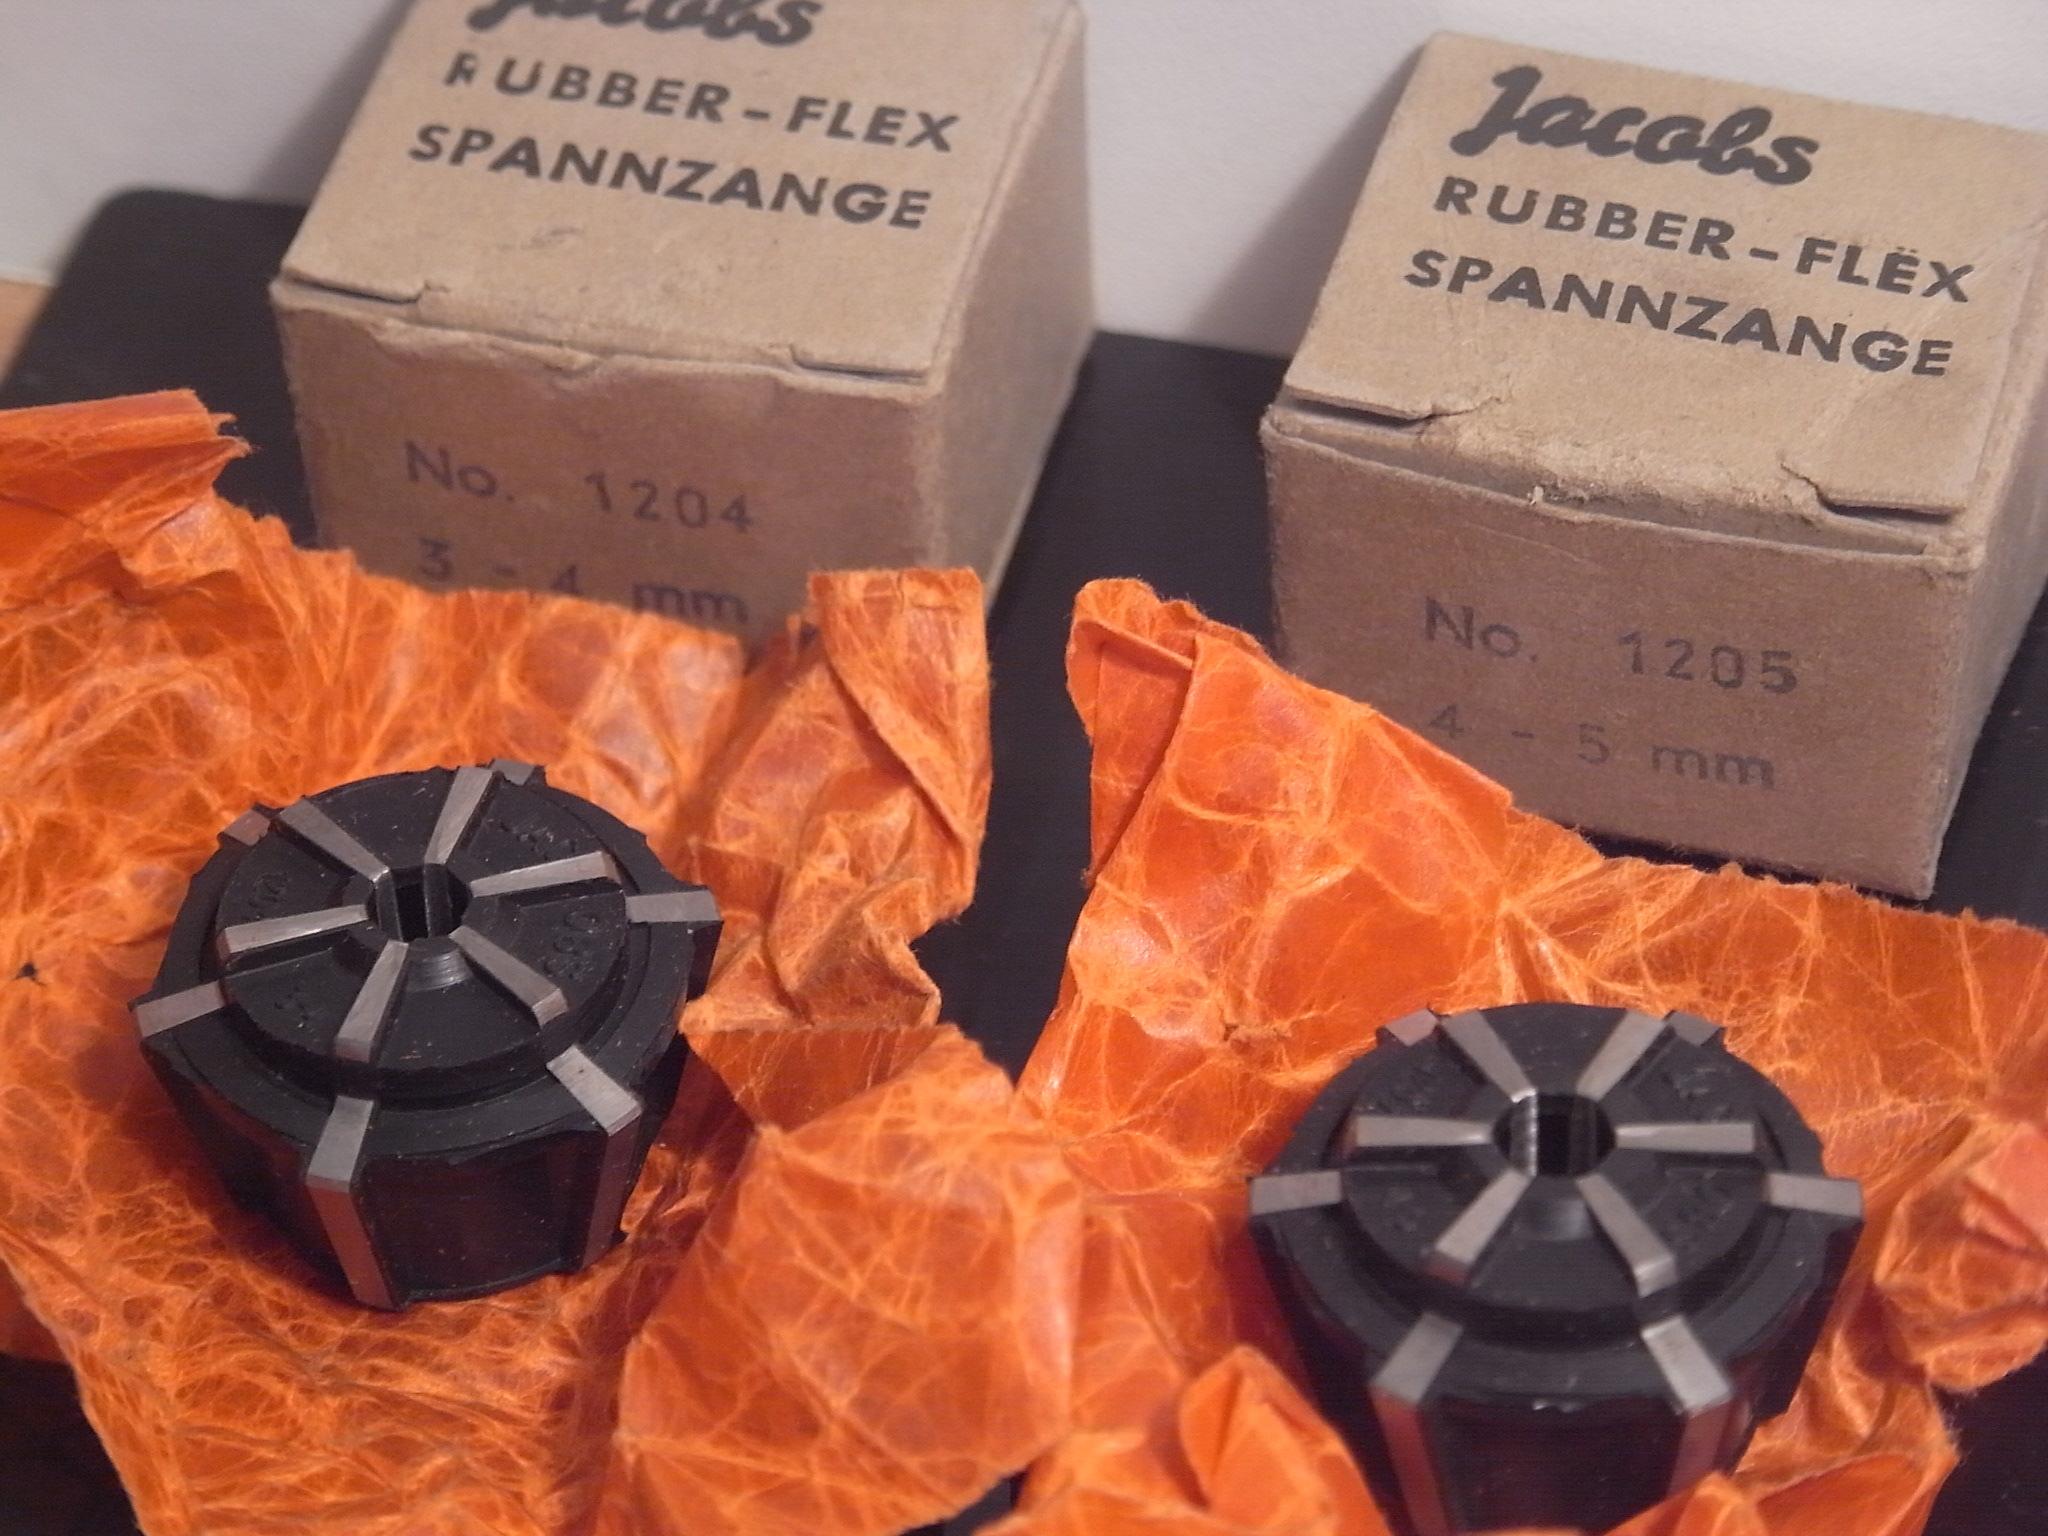 Stellhülse 28 Spannzangenfutter 2 Spannzangen ORTLIEB 2,8-7-13 mm Rubber-Flex